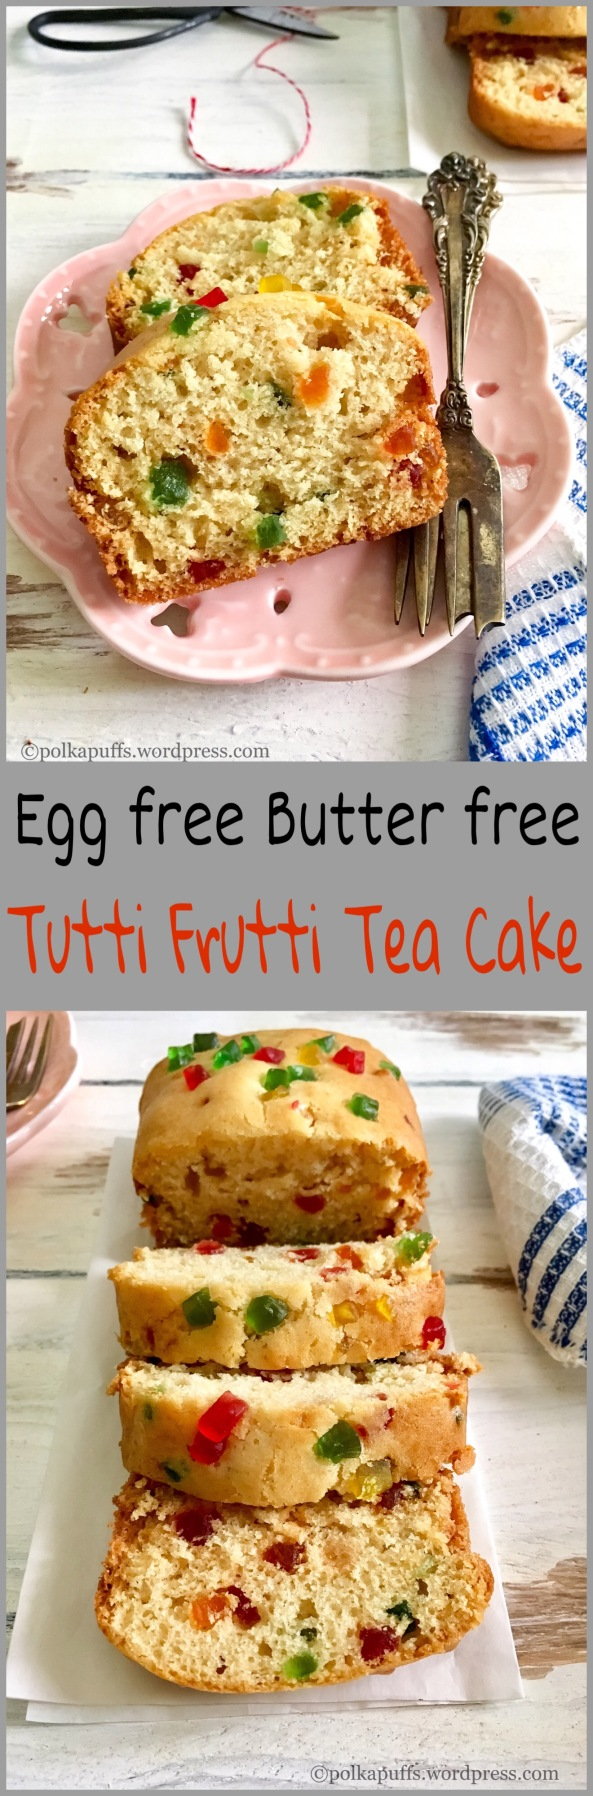 Egg free Butter free tutti Frutti Tea cake